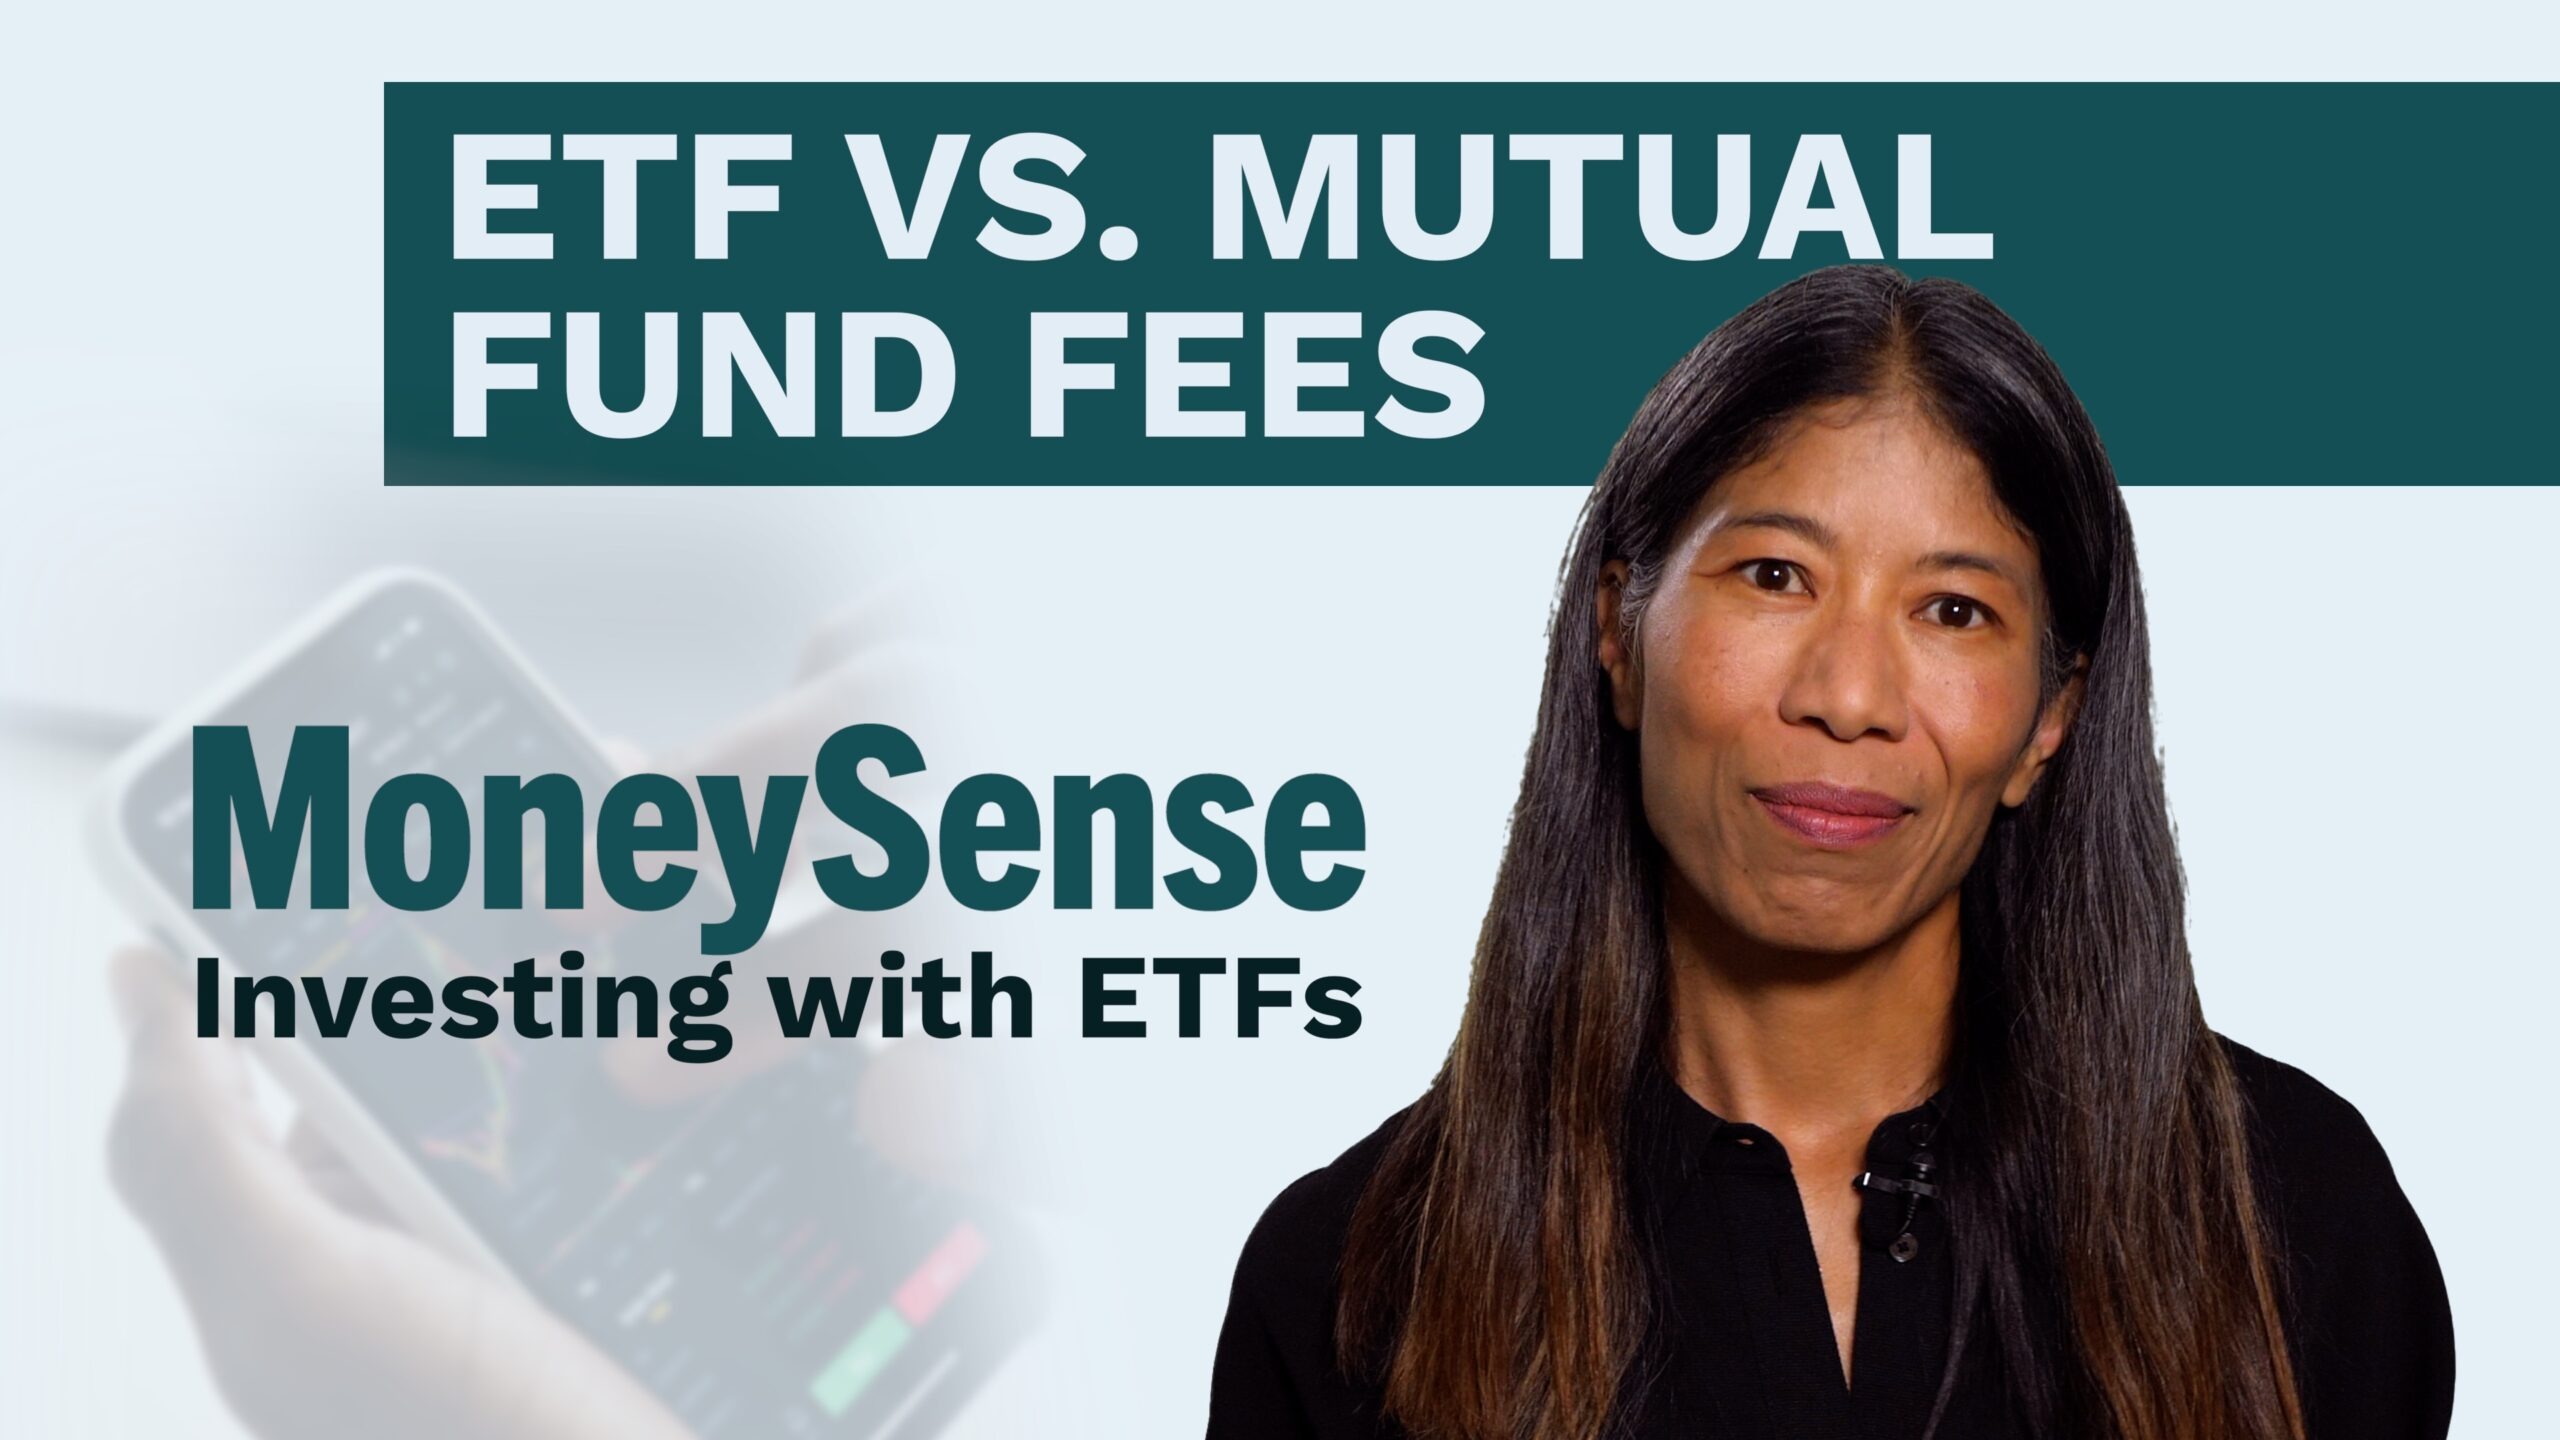 moneysense editor discusses etf vs. mutual fund fees